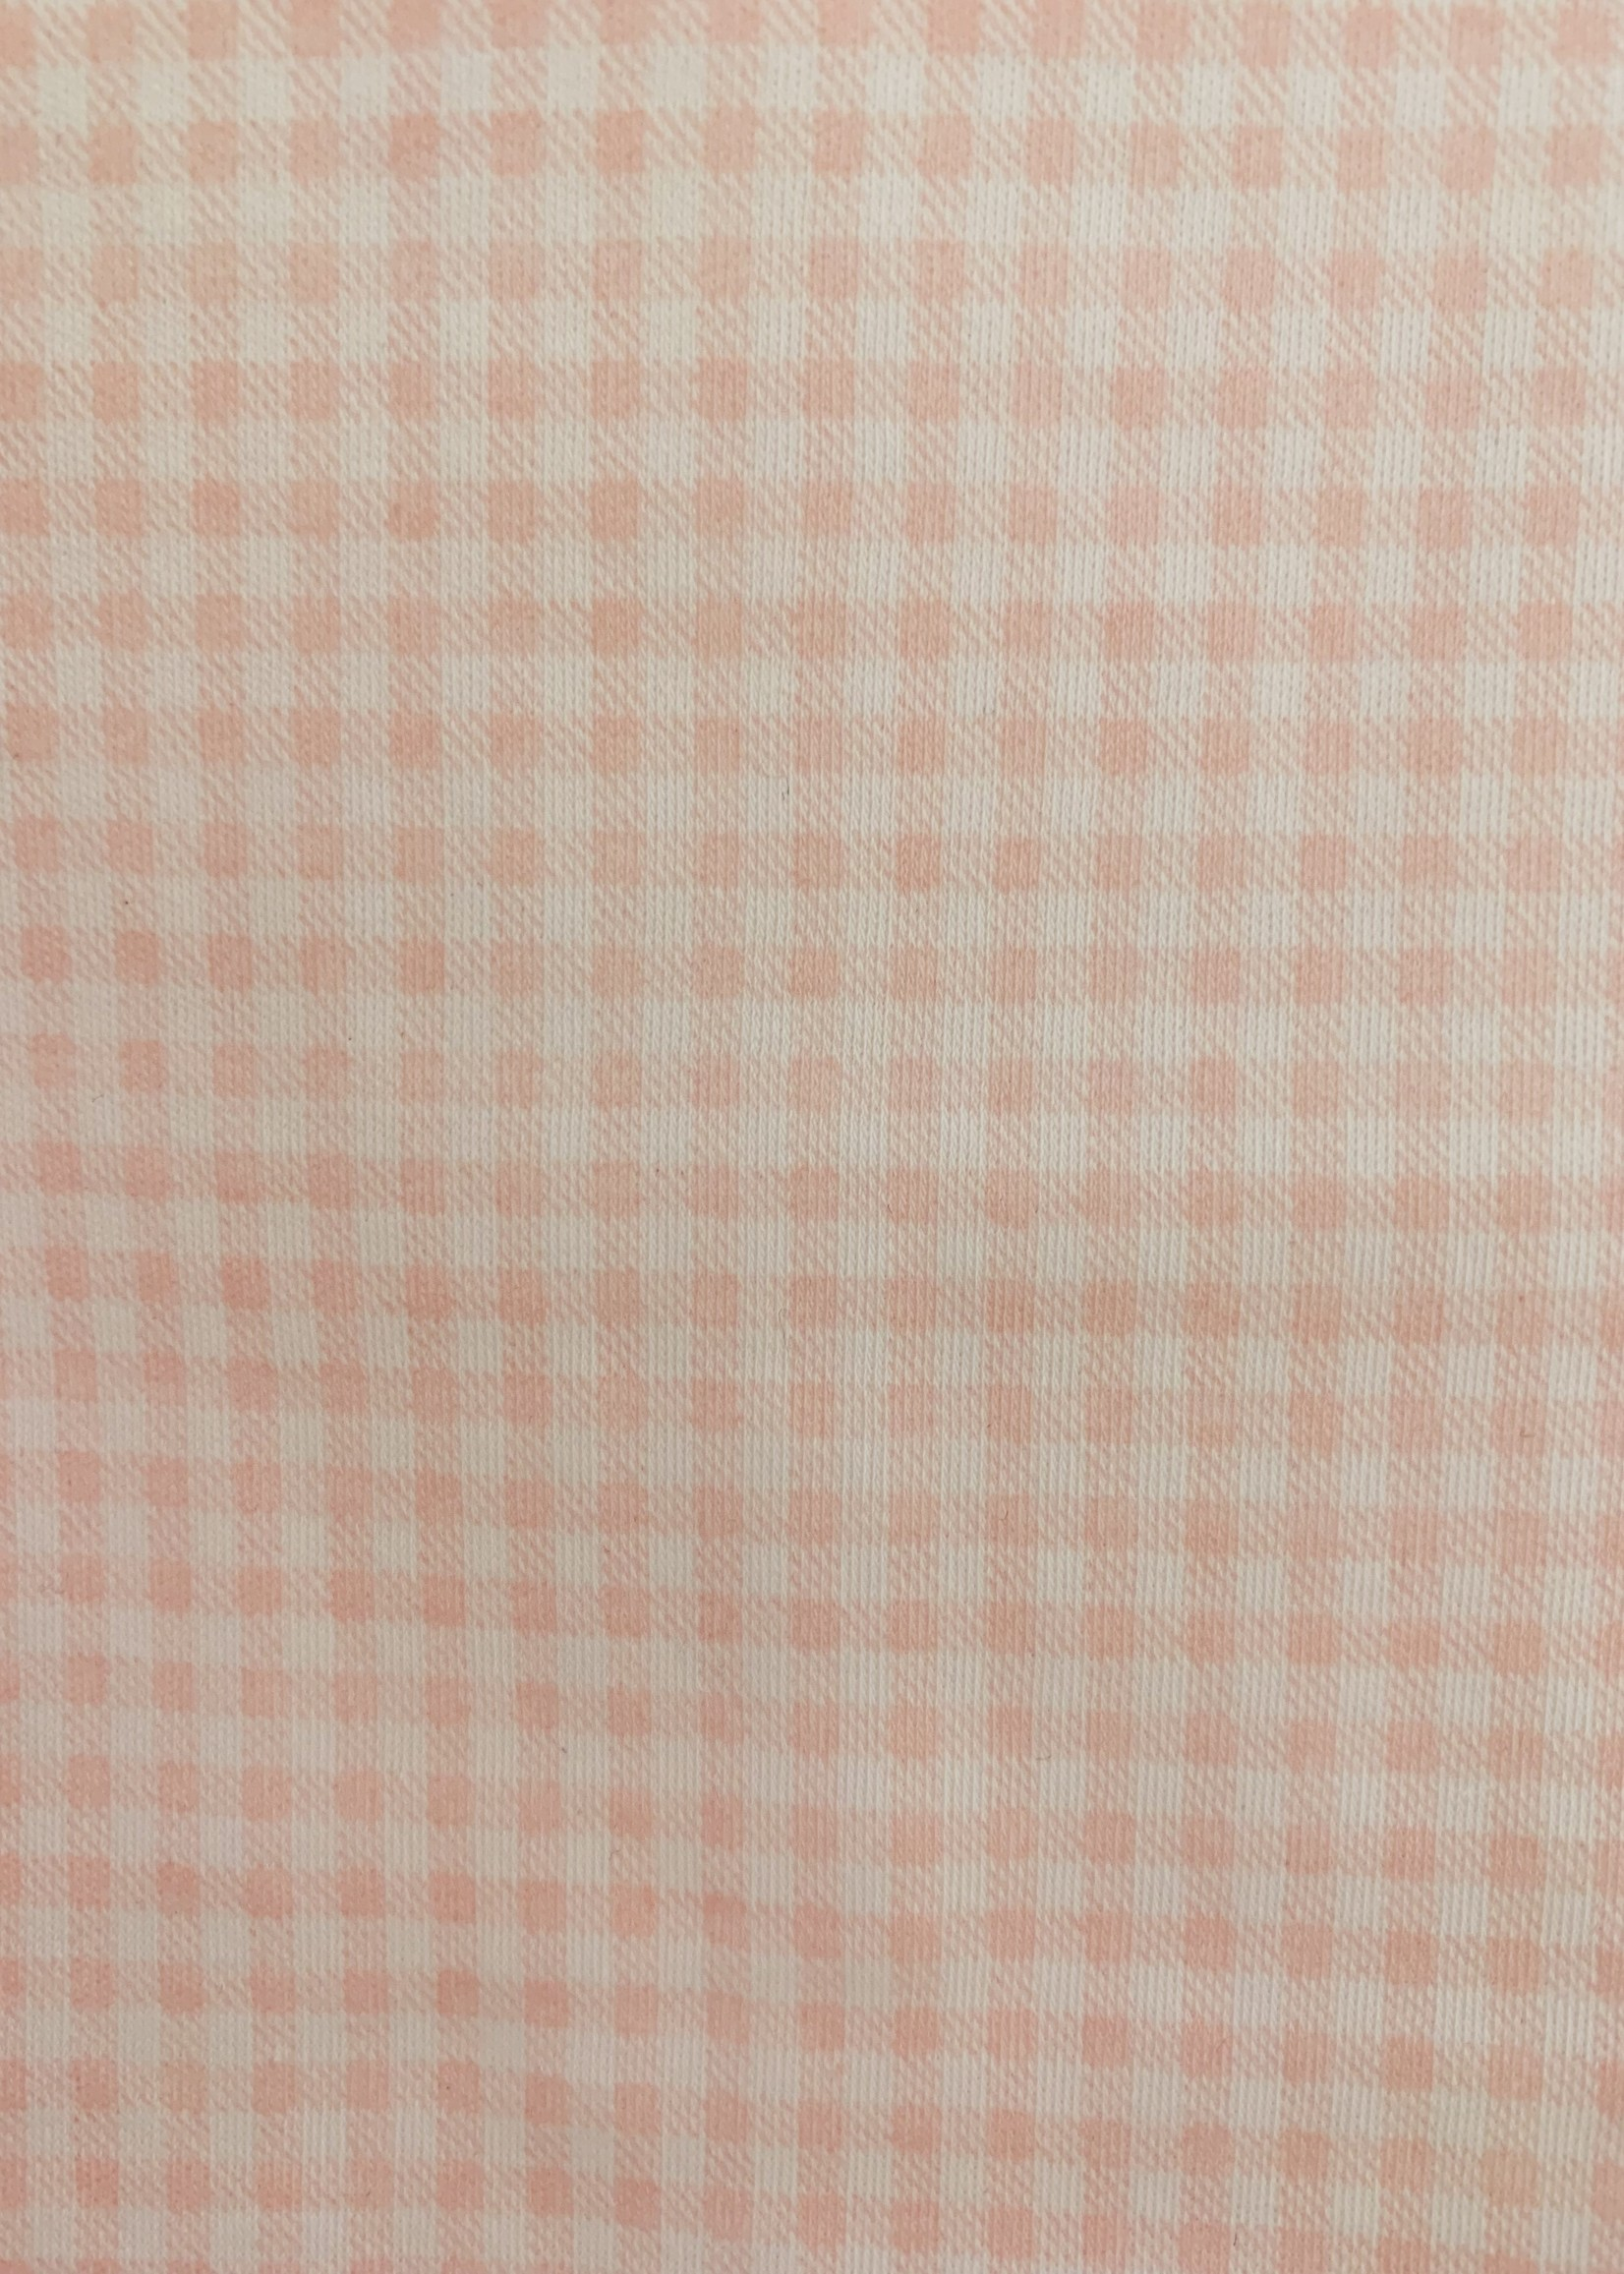 PINK VICHY BASICS CROCHET PJS